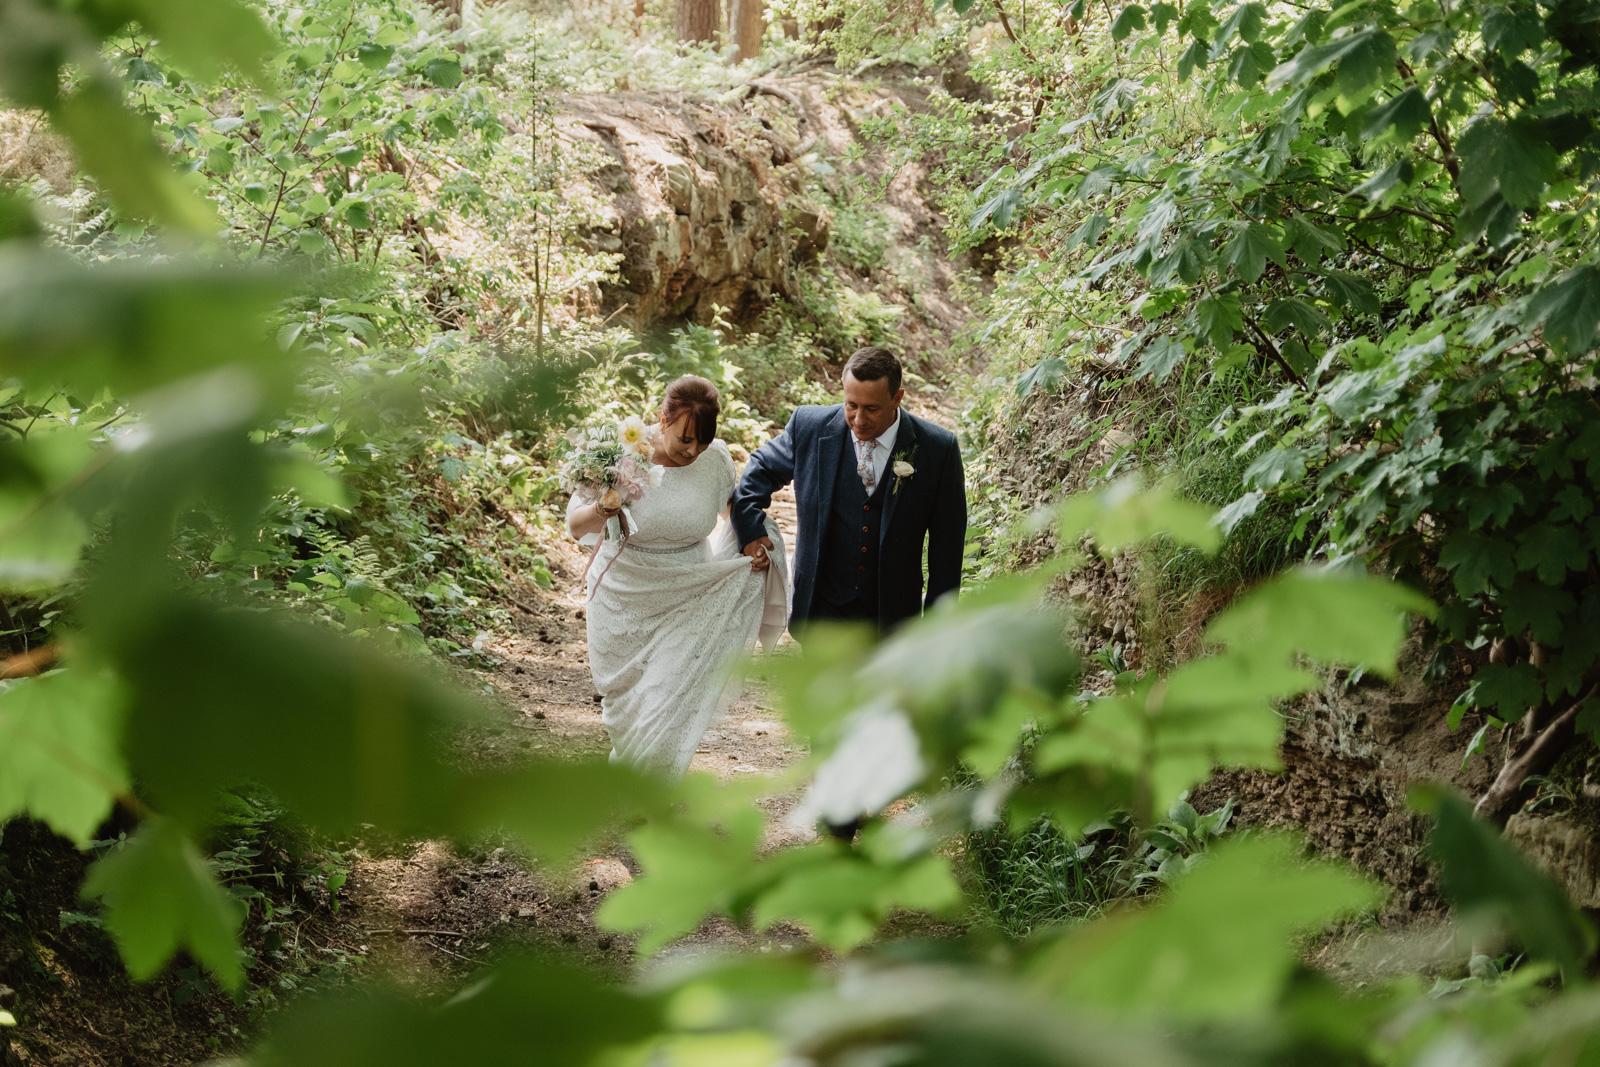 Bridgette-Dahlia-Blush-Silk-Lace-Wedding-Dress-Kate-Beaumont-Sheffield-Ivory-Fayre-15.jpg